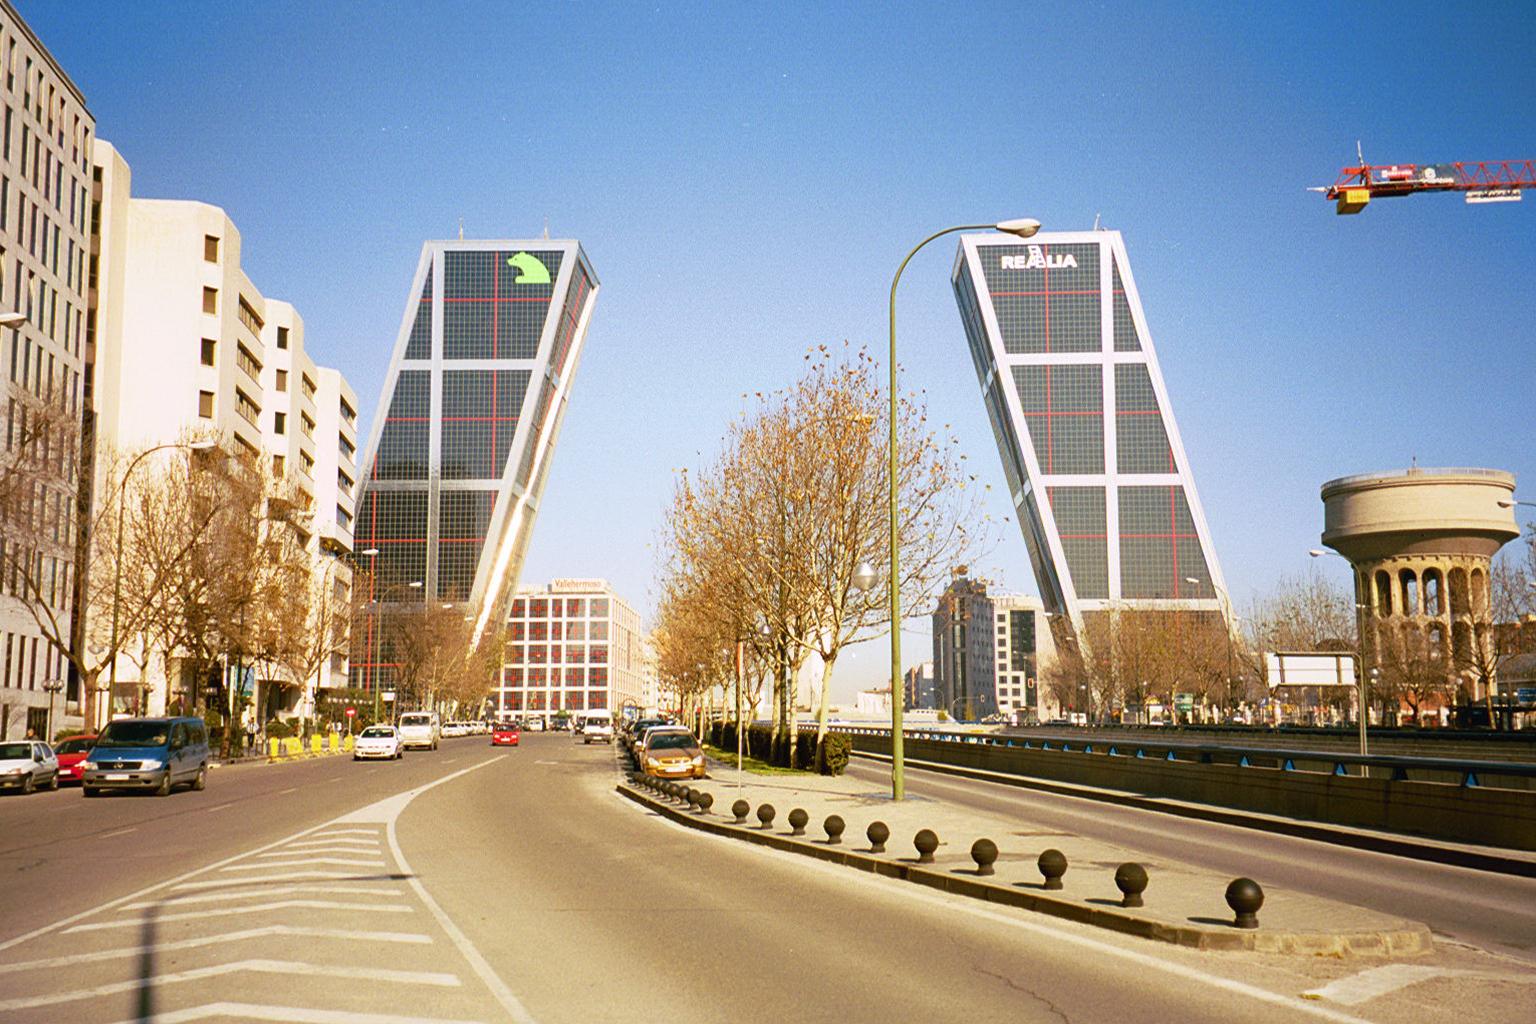 File puerta de europa madrid wikimedia commons - Puerta europa almeria ...